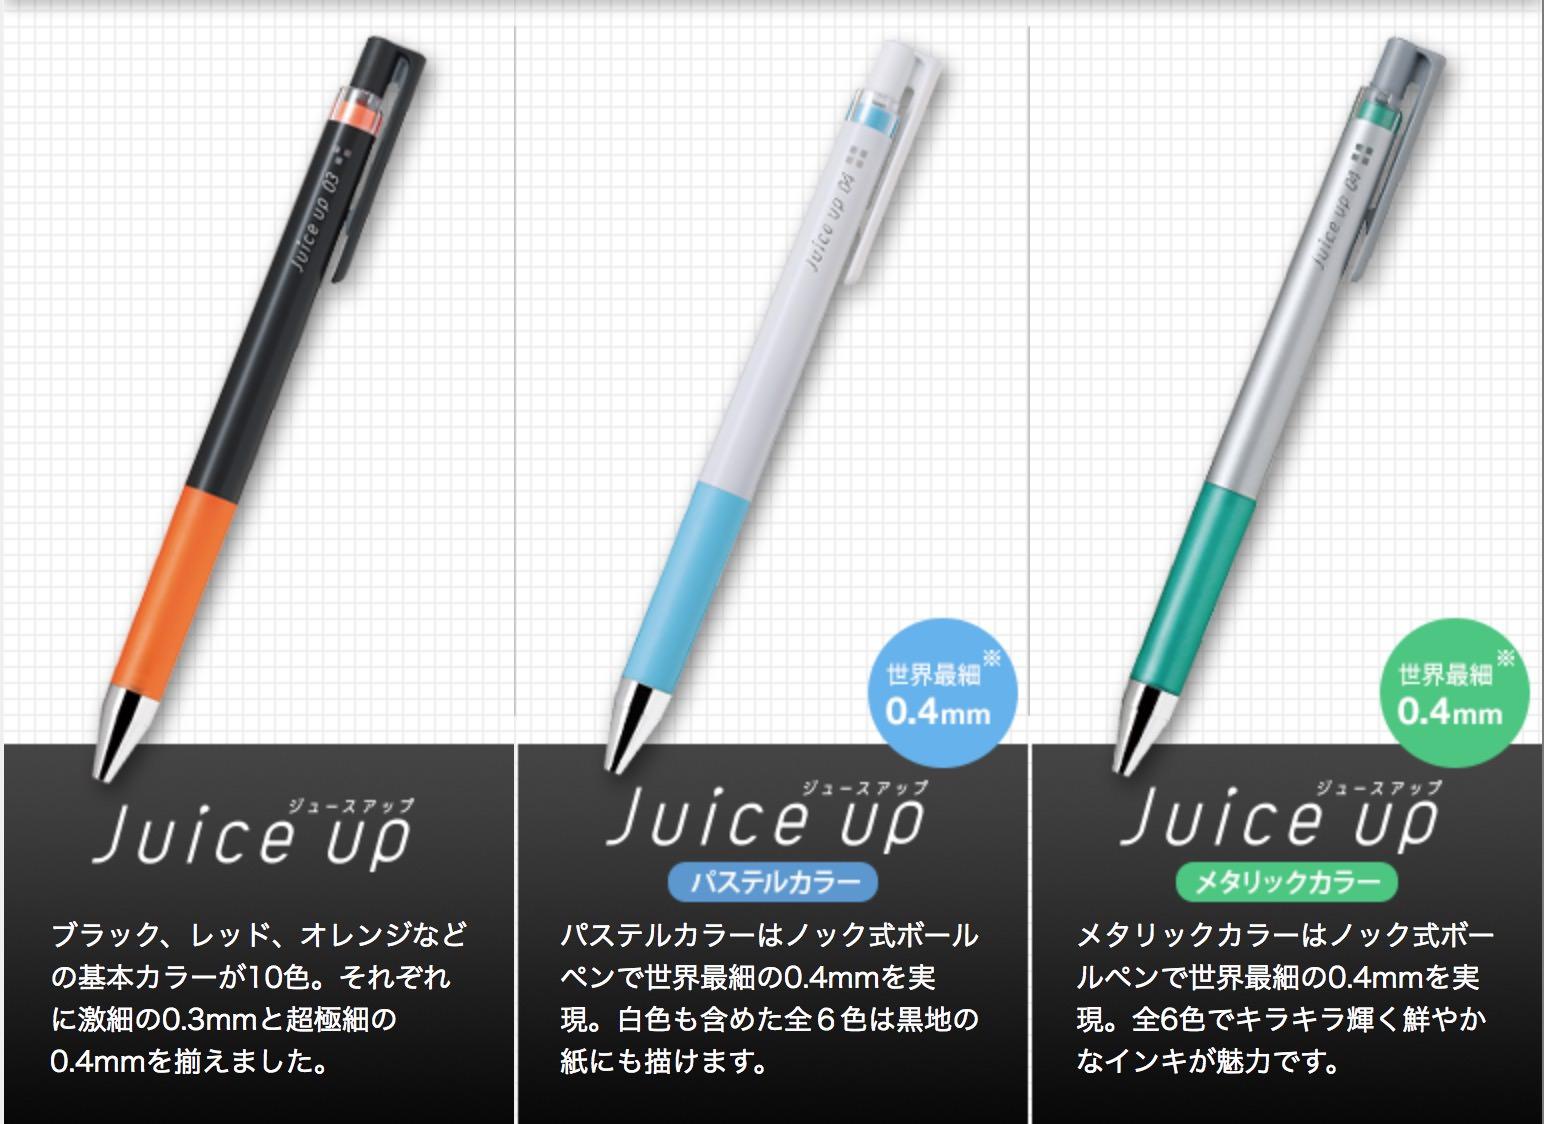 gekiboso-pen-ha-juice-up_6